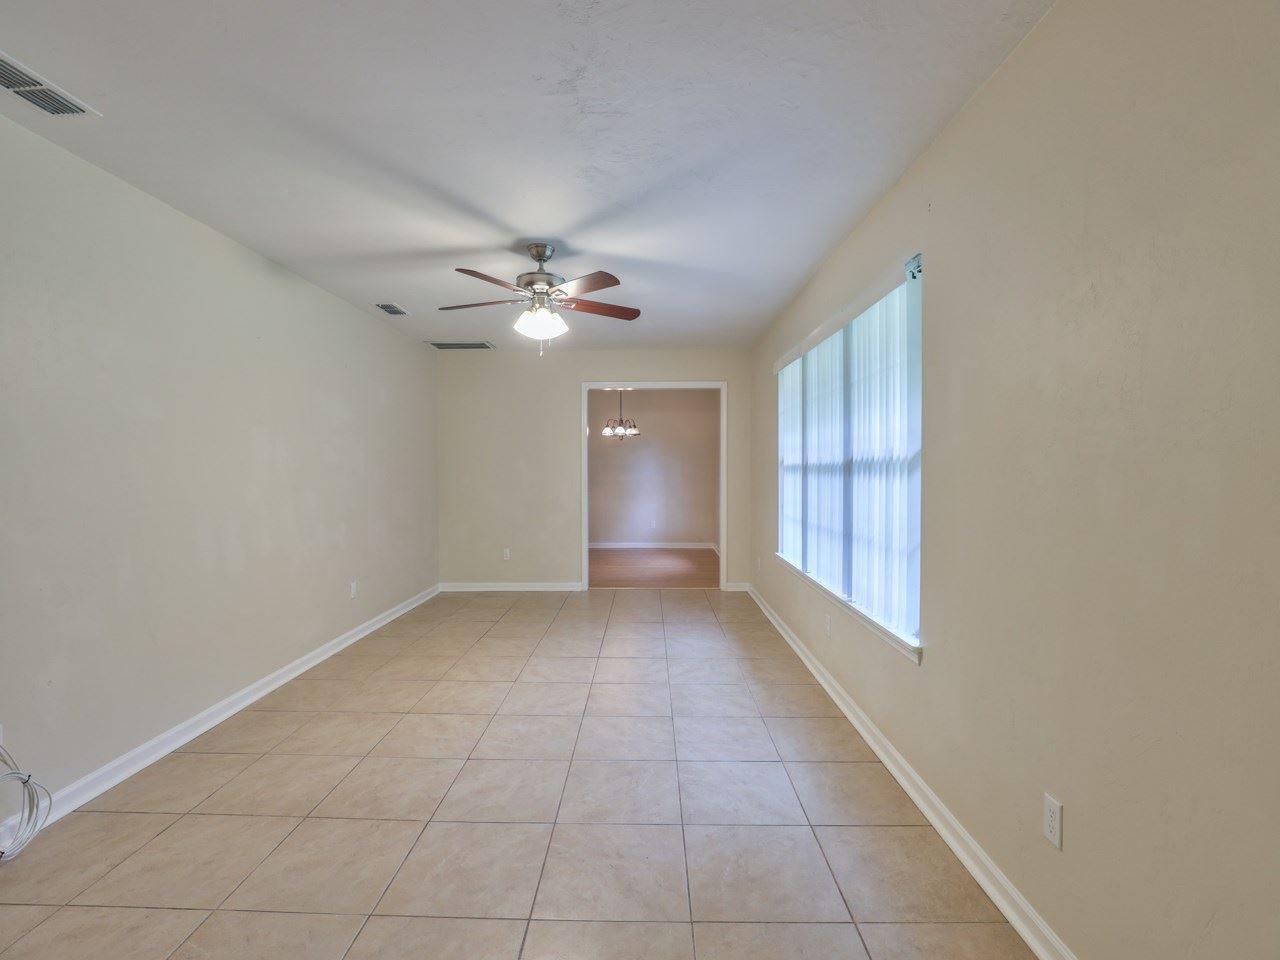 Photo of 805 Sandy Court, TALLAHASSEE, FL 32312 (MLS # 324426)